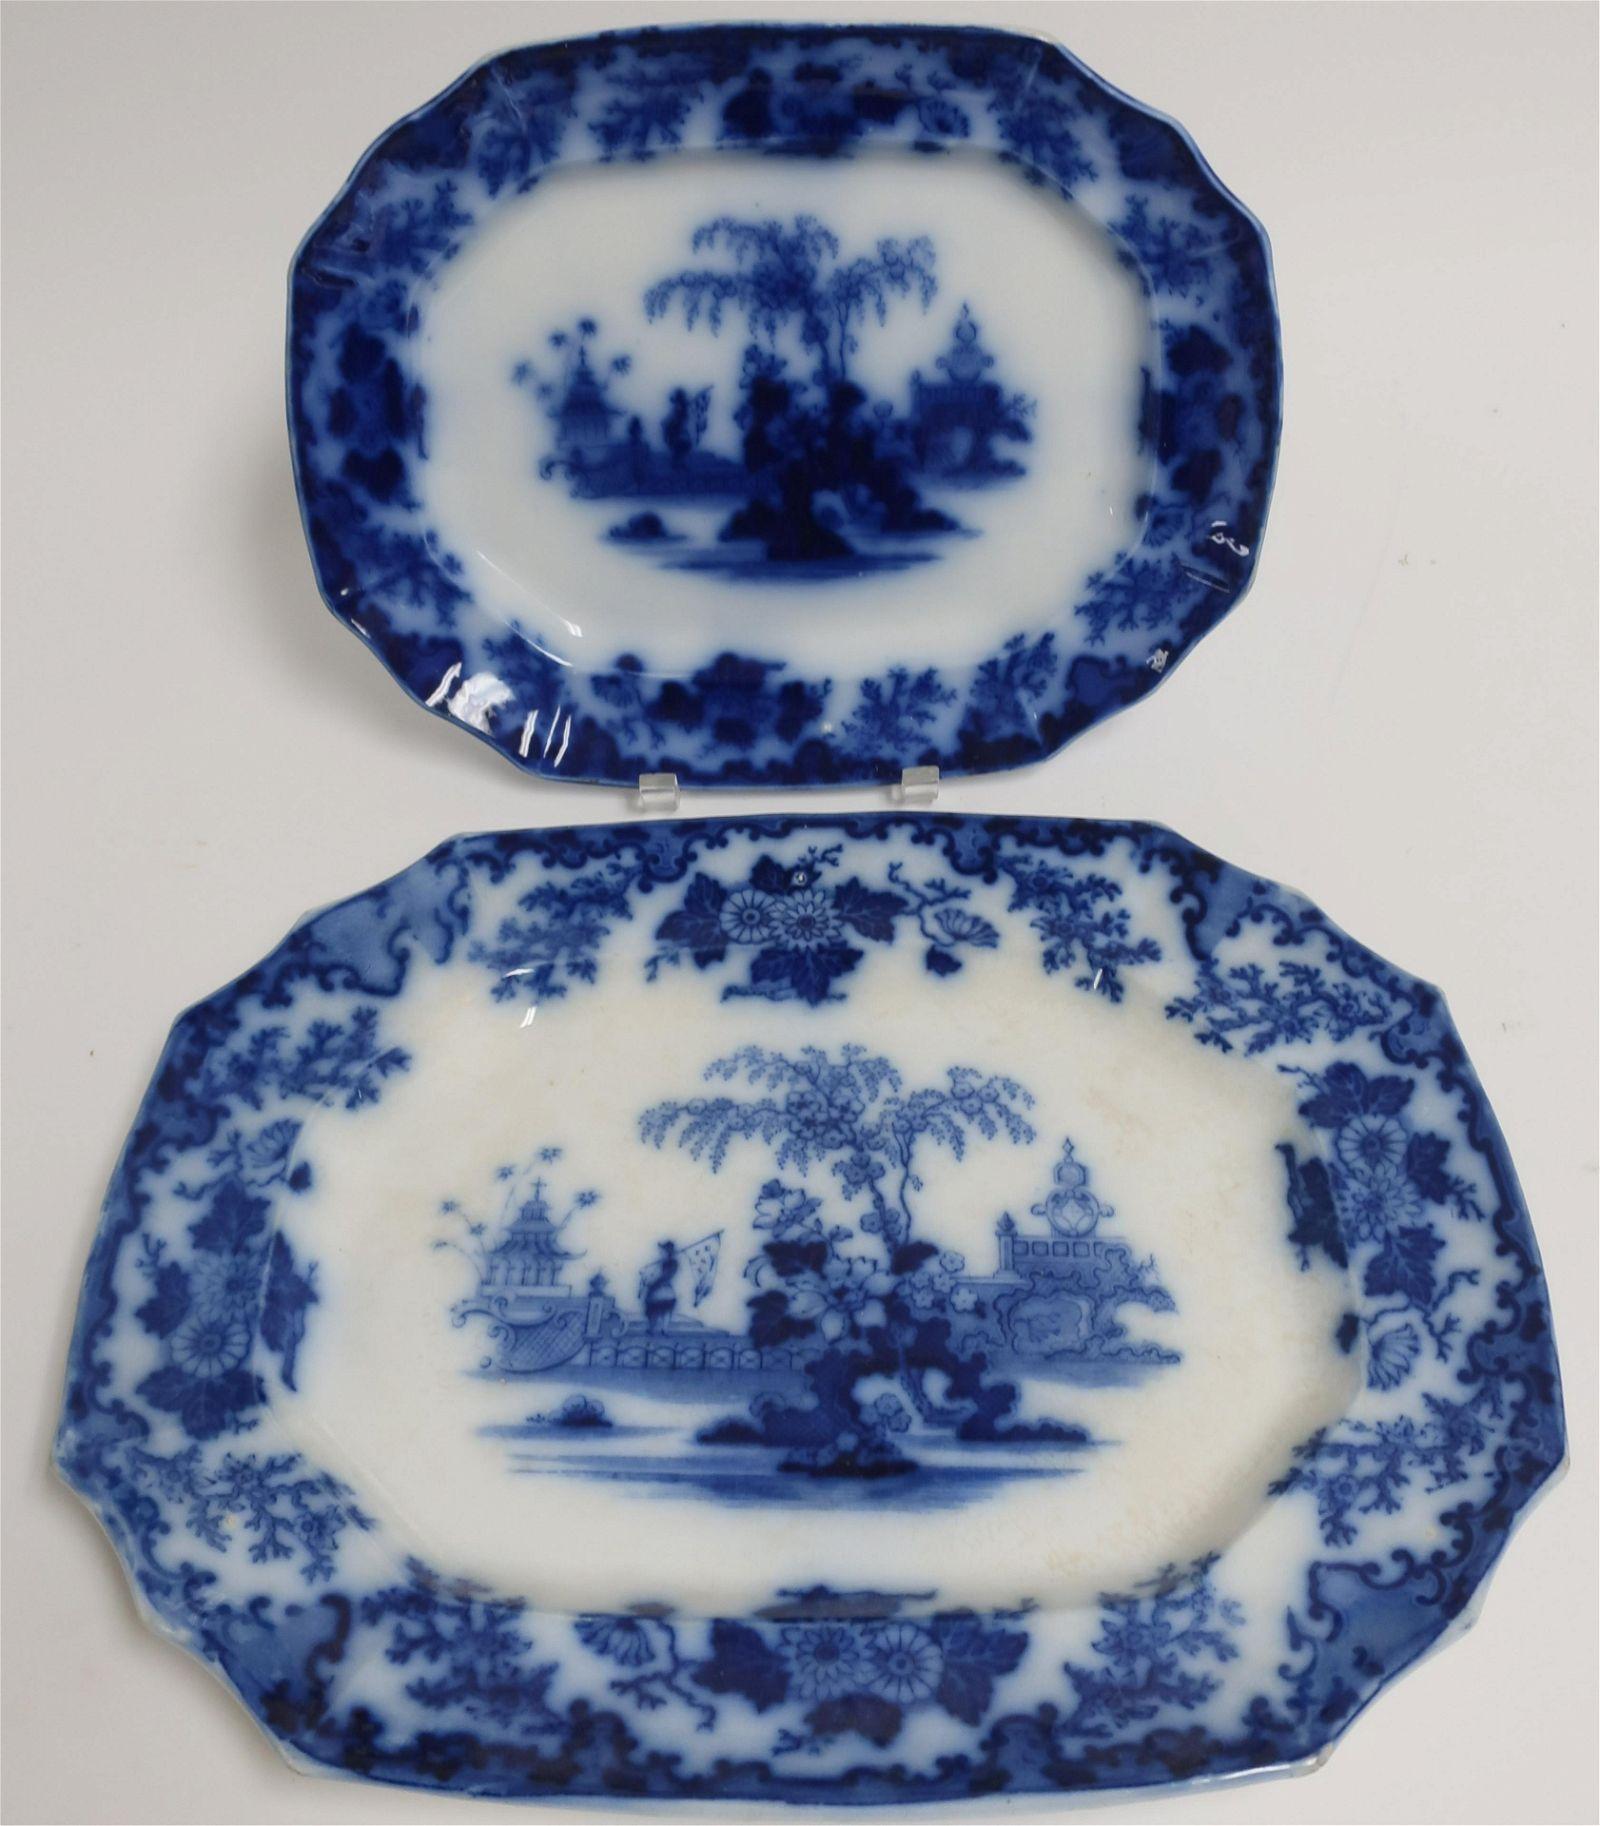 2 Flow Blue 'Scinde' Transferware Platters, 19th C